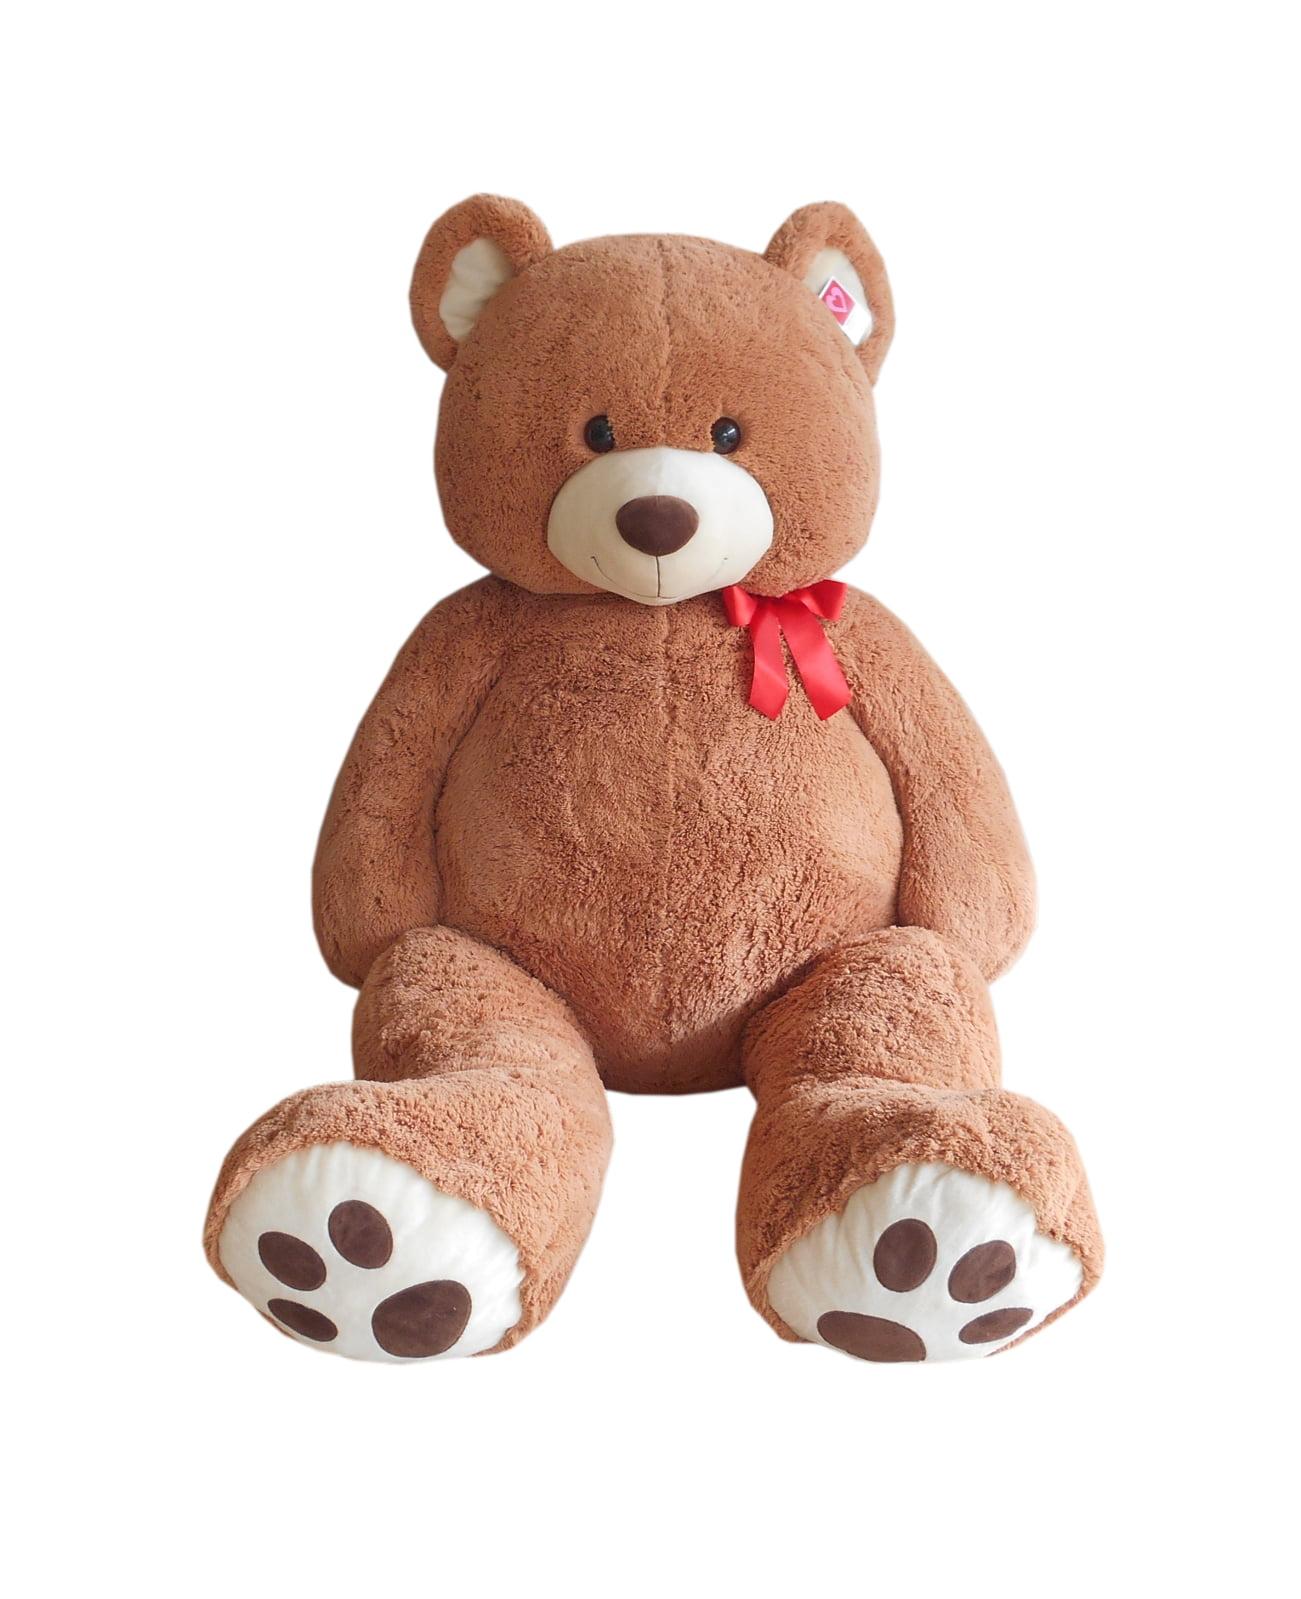 Baby Net For Stuffed Animals, Way To Celebrate Valentine S Day Jumbo Plush Tan Bear Walmart Com Walmart Com